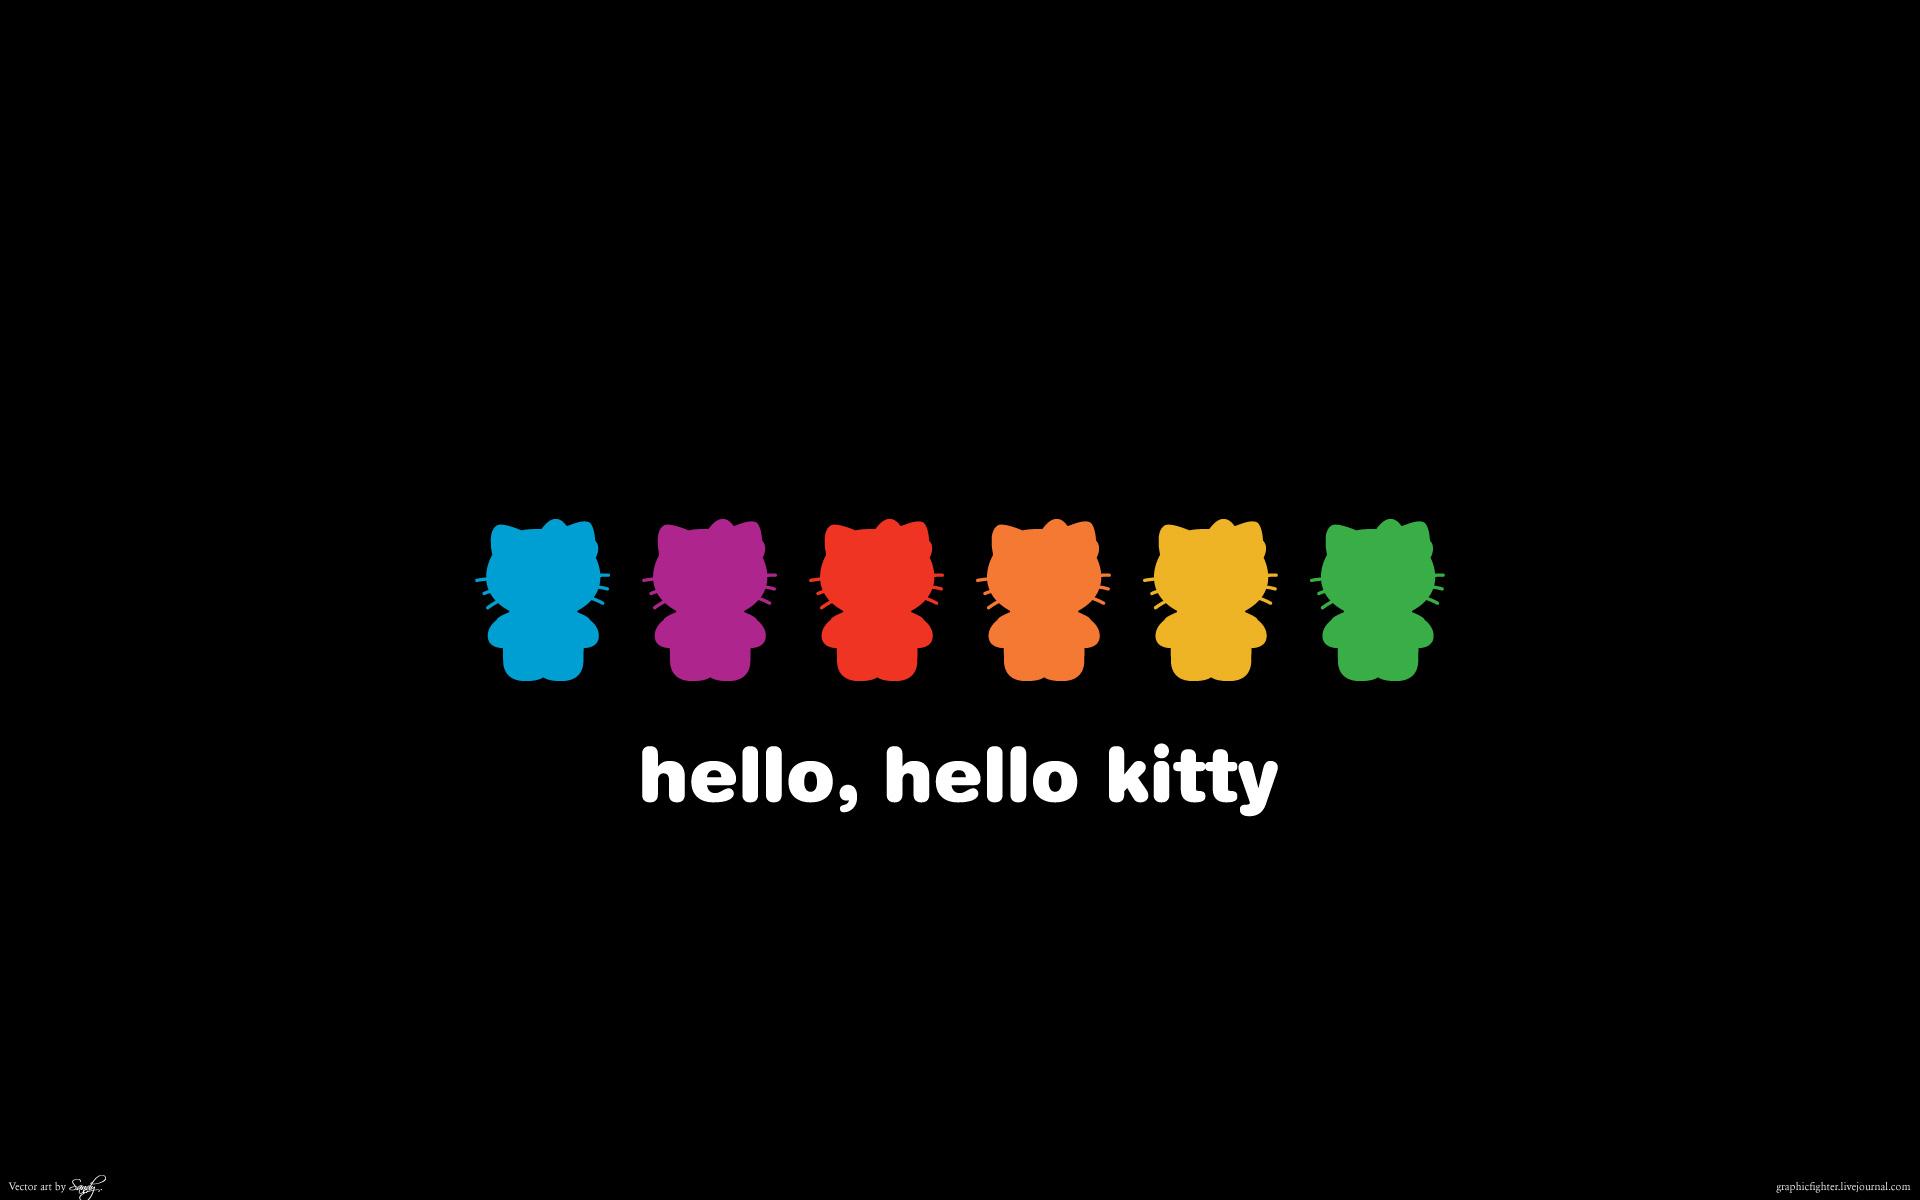 Wonderful Wallpaper Hello Kitty Cheetah - black-hello-kitty-wallpaper-7  Pic_52151.jpg